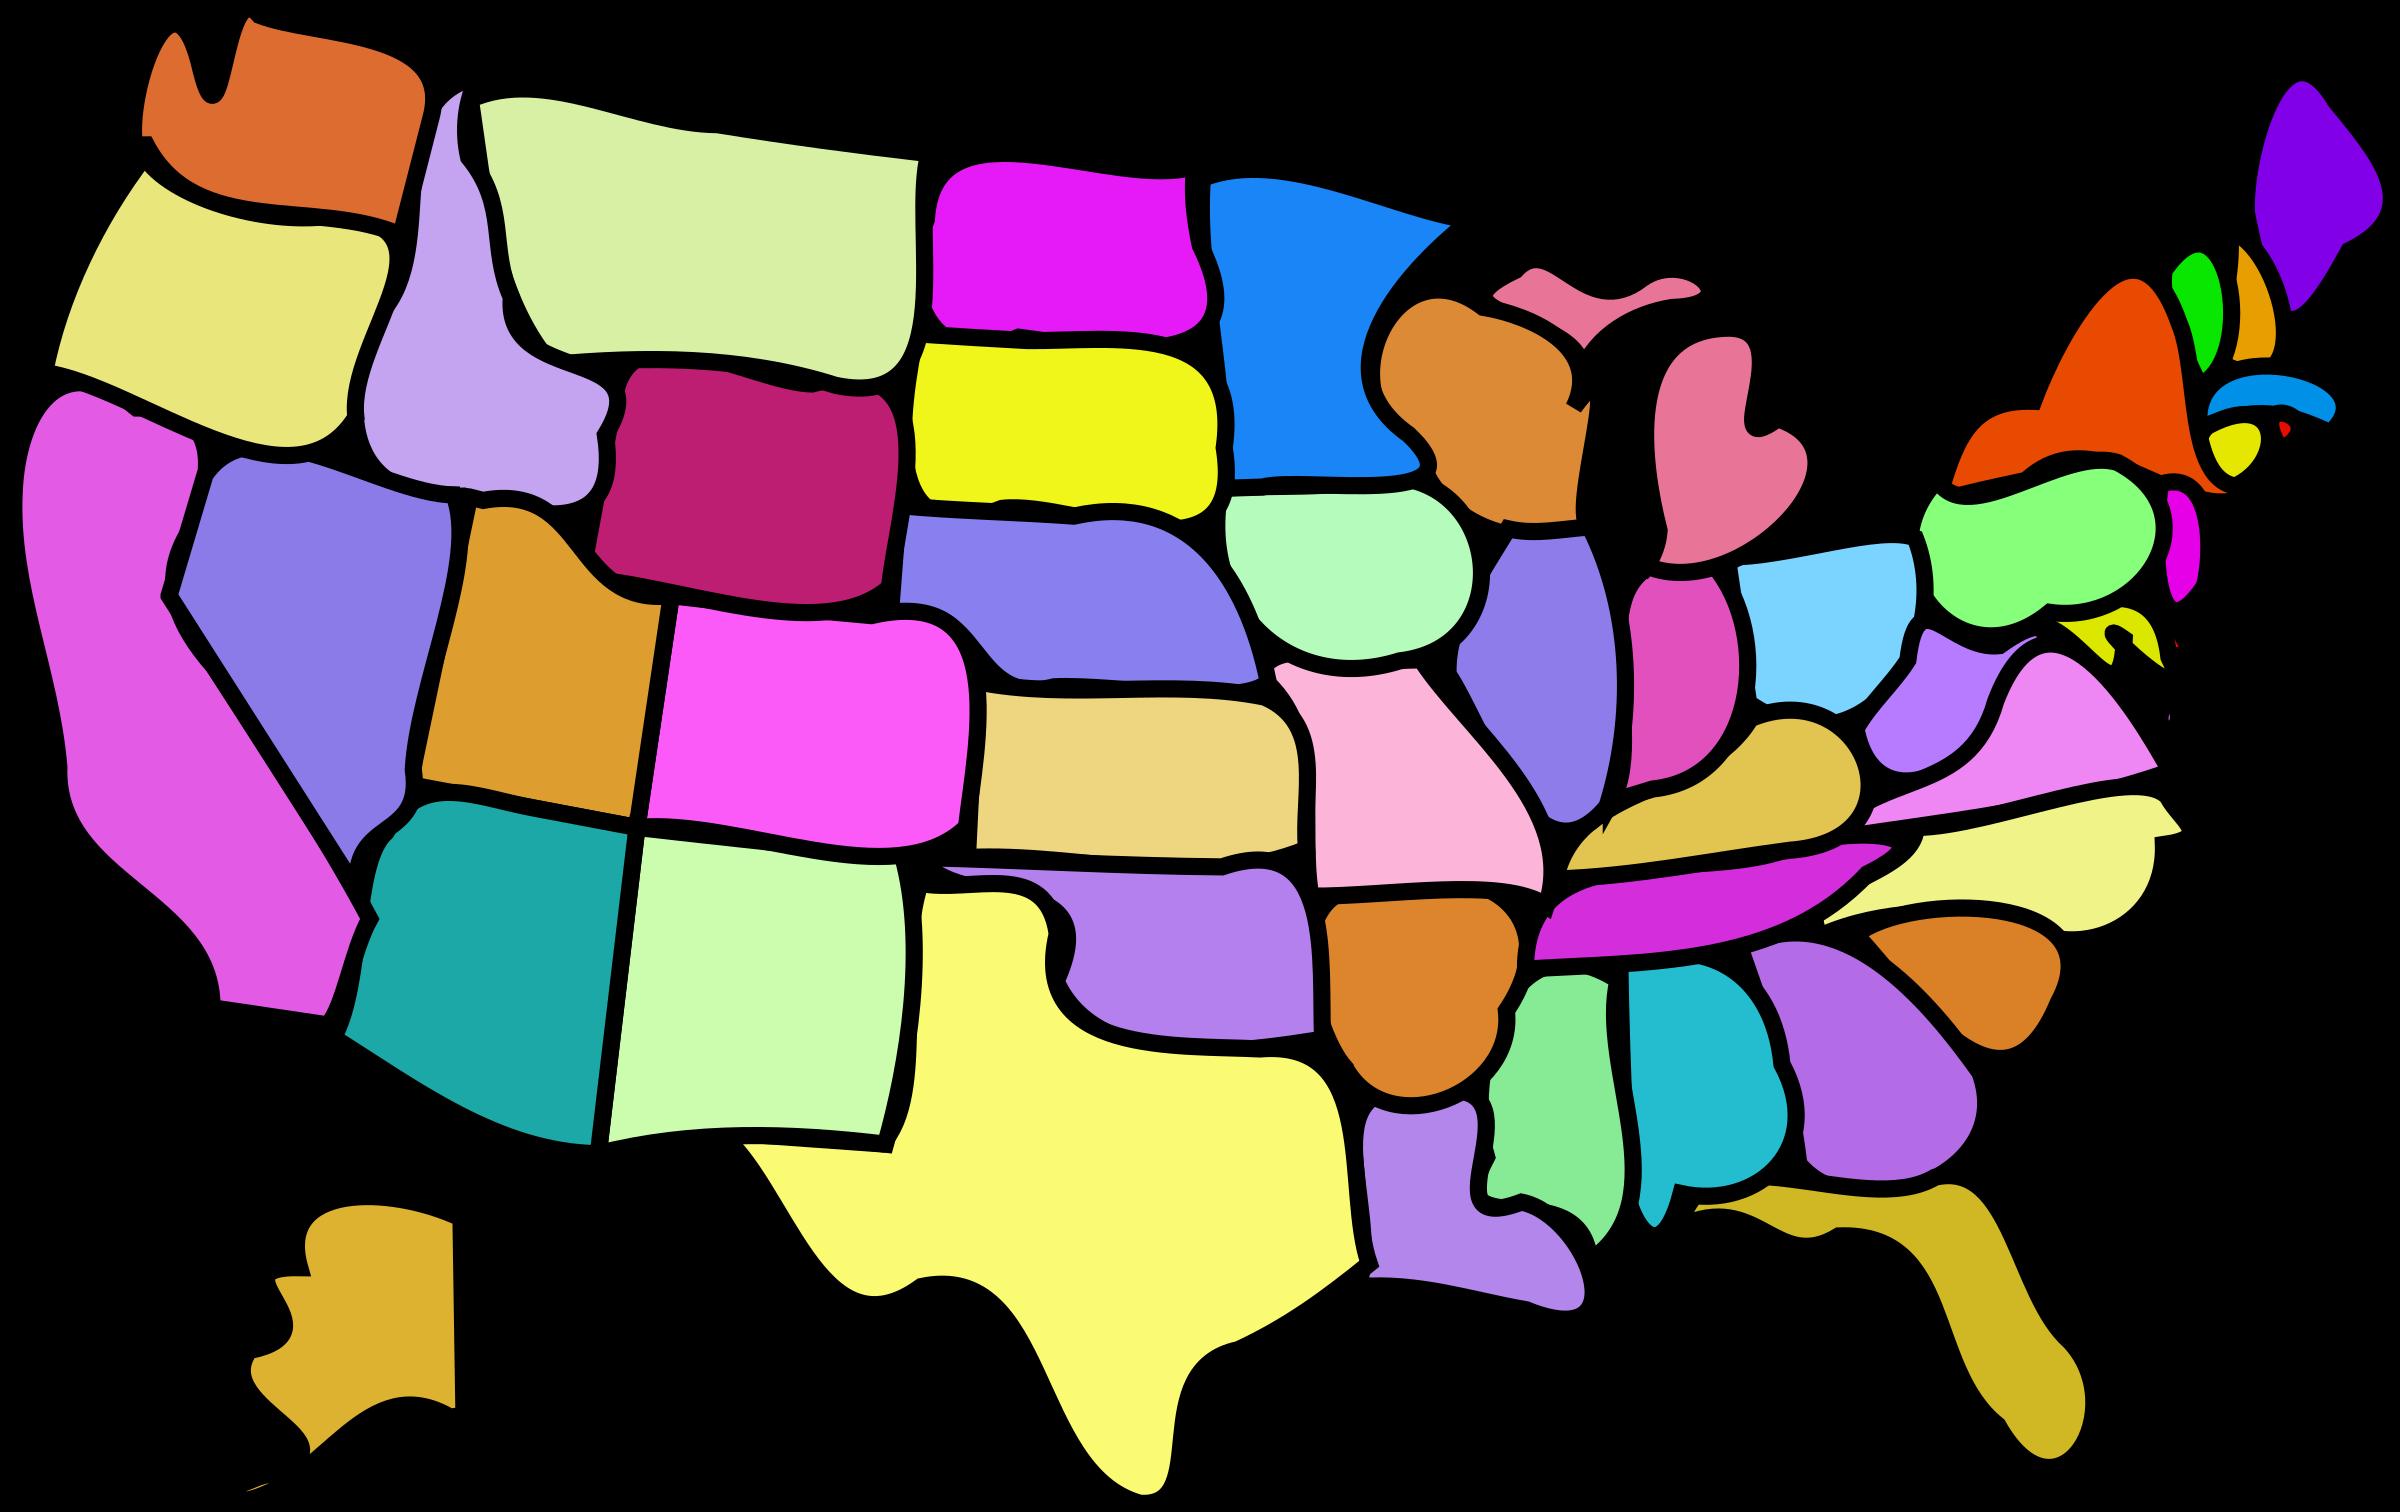 Words clipart geography. U s map cartoony